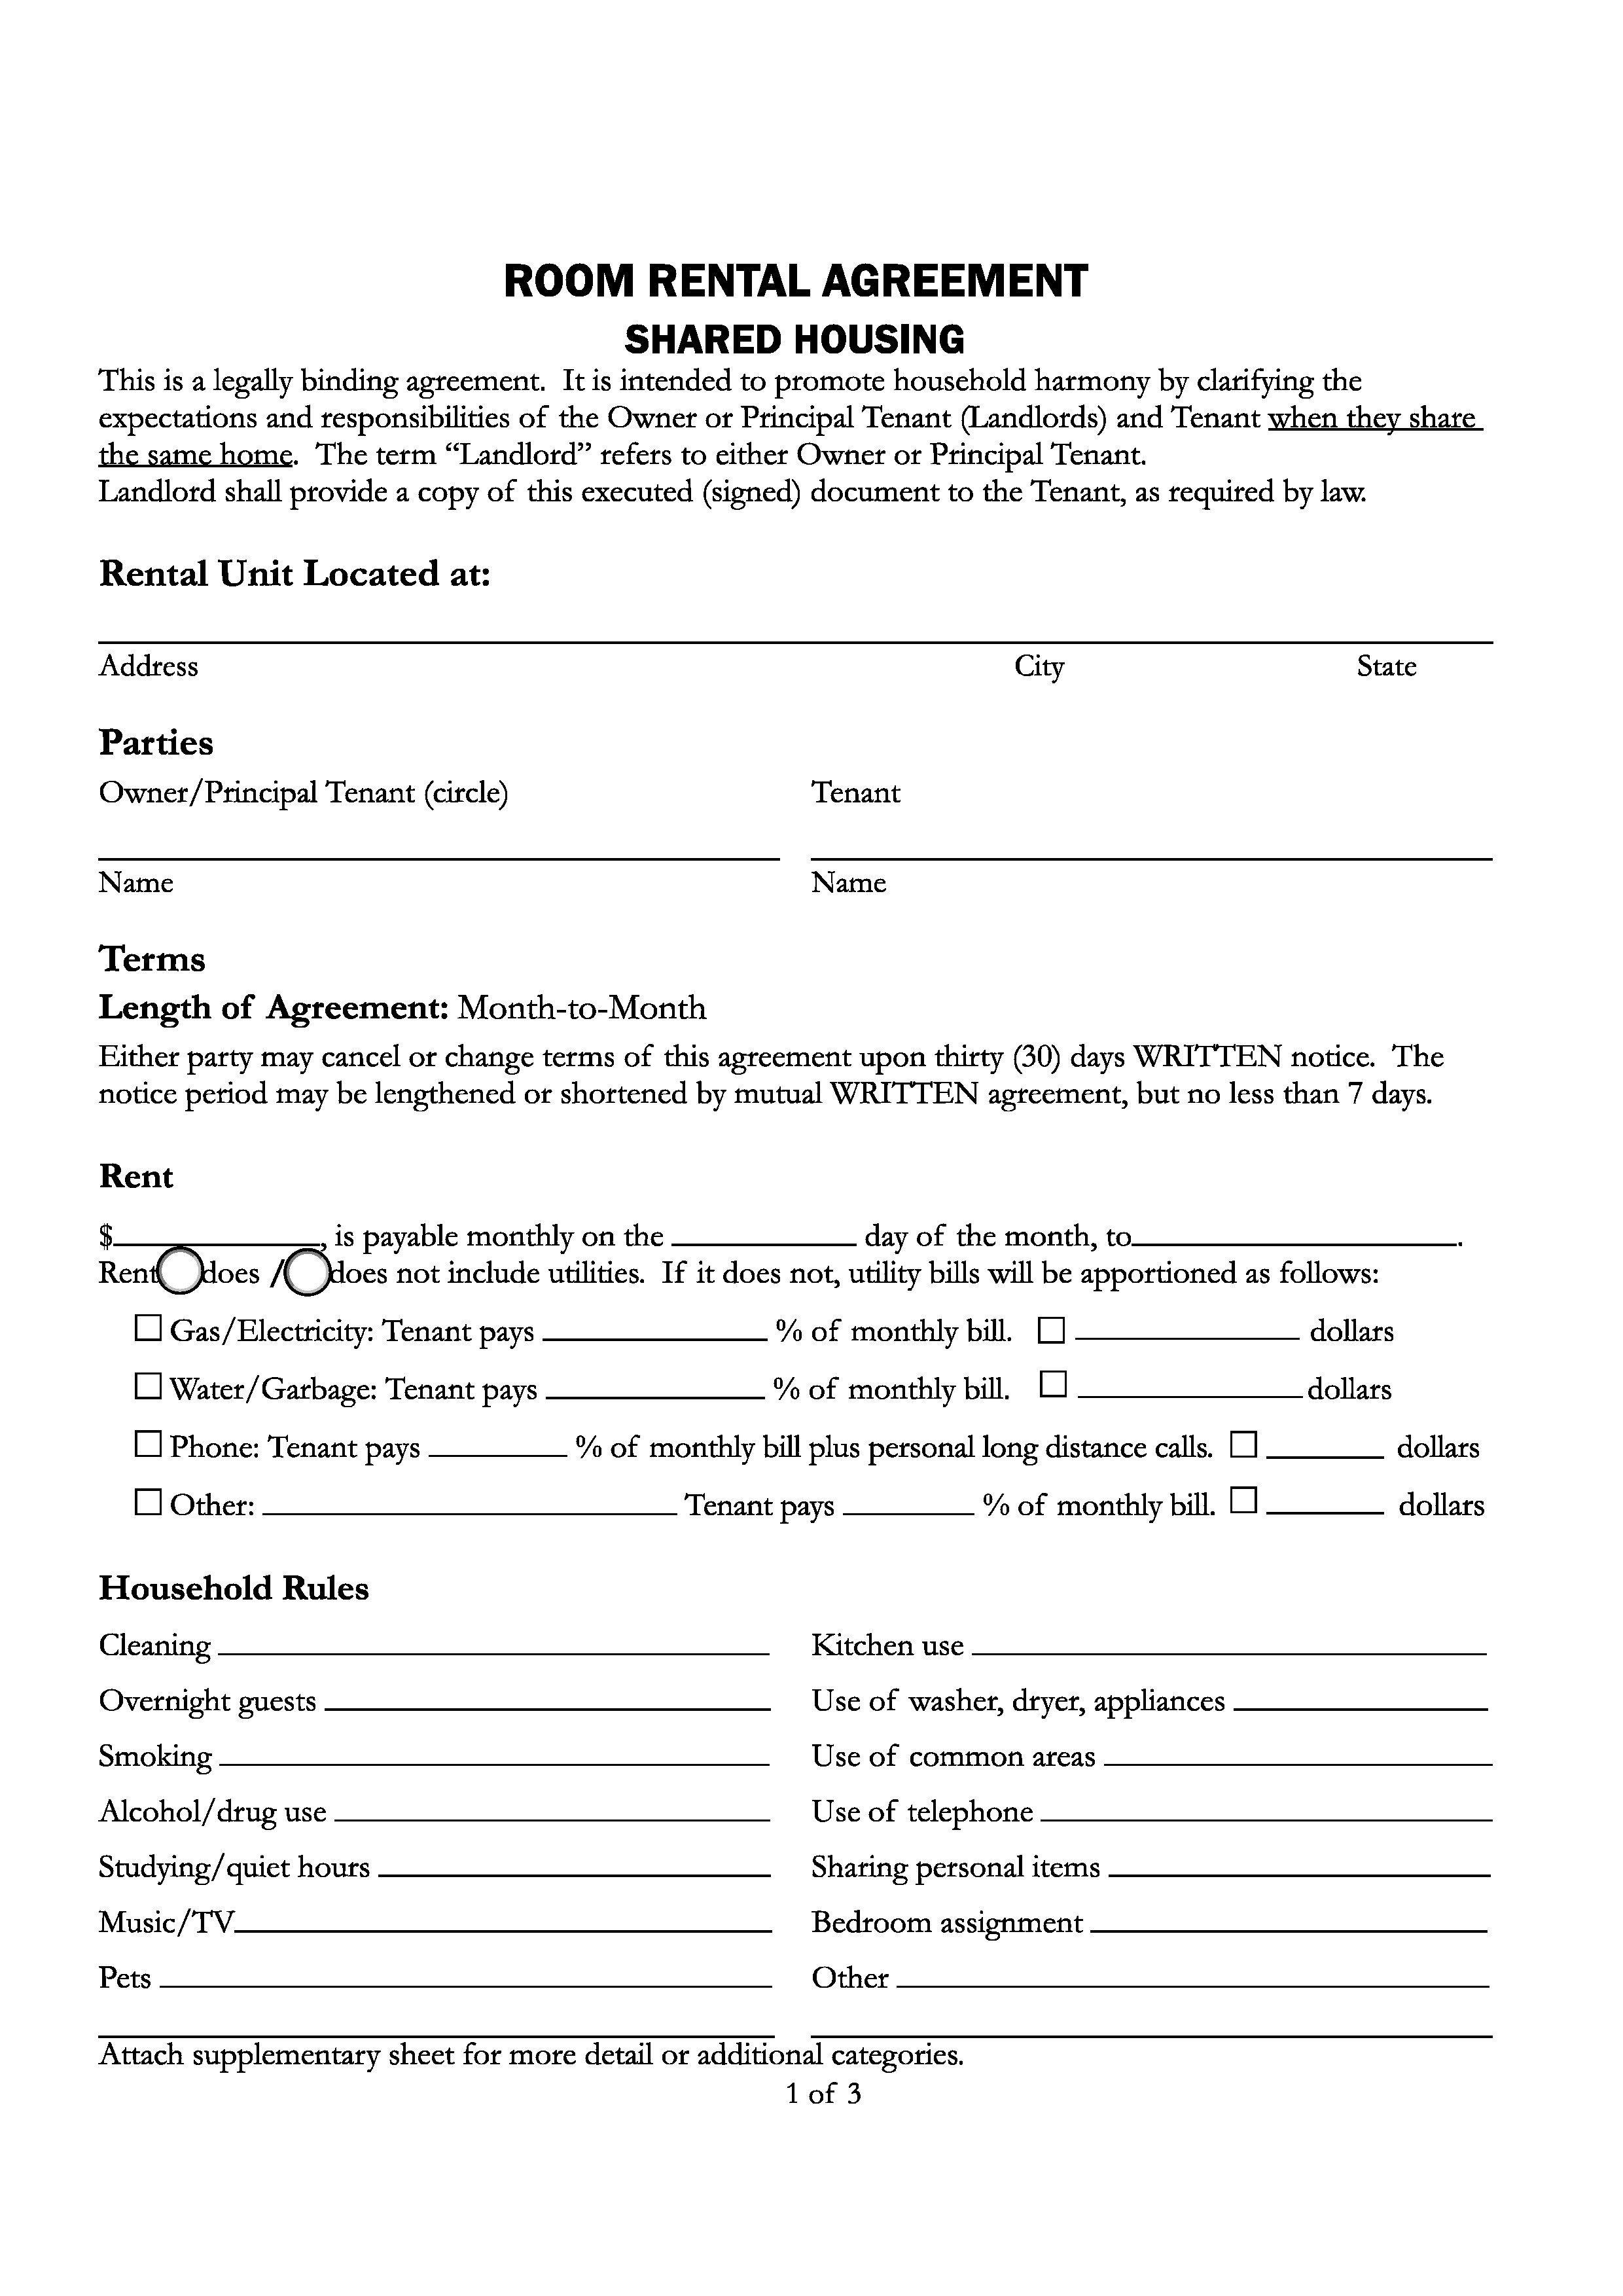 009 Impressive Room Rental Agreement Simple Form Design  Template Word Doc Rent Format In Free UkFull